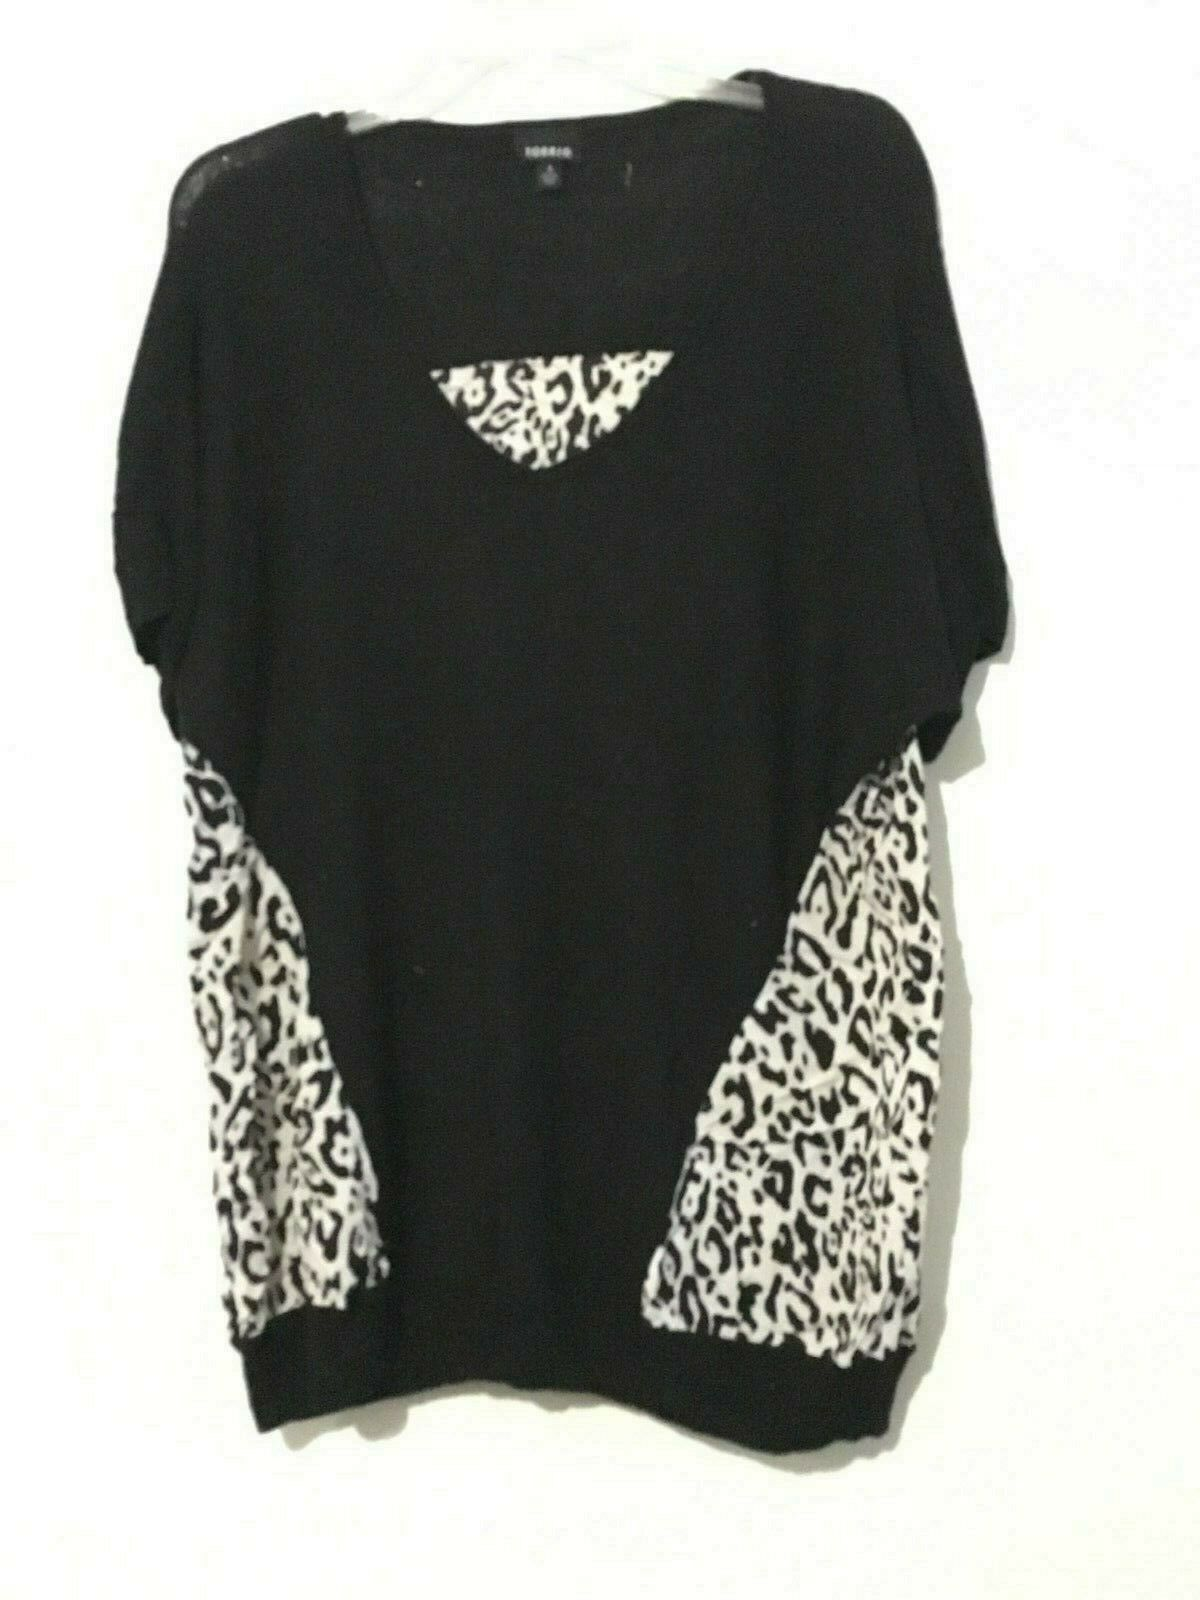 Torrid schwarz Floral Animal Print Top Blouse Größe 1 damen Stylish